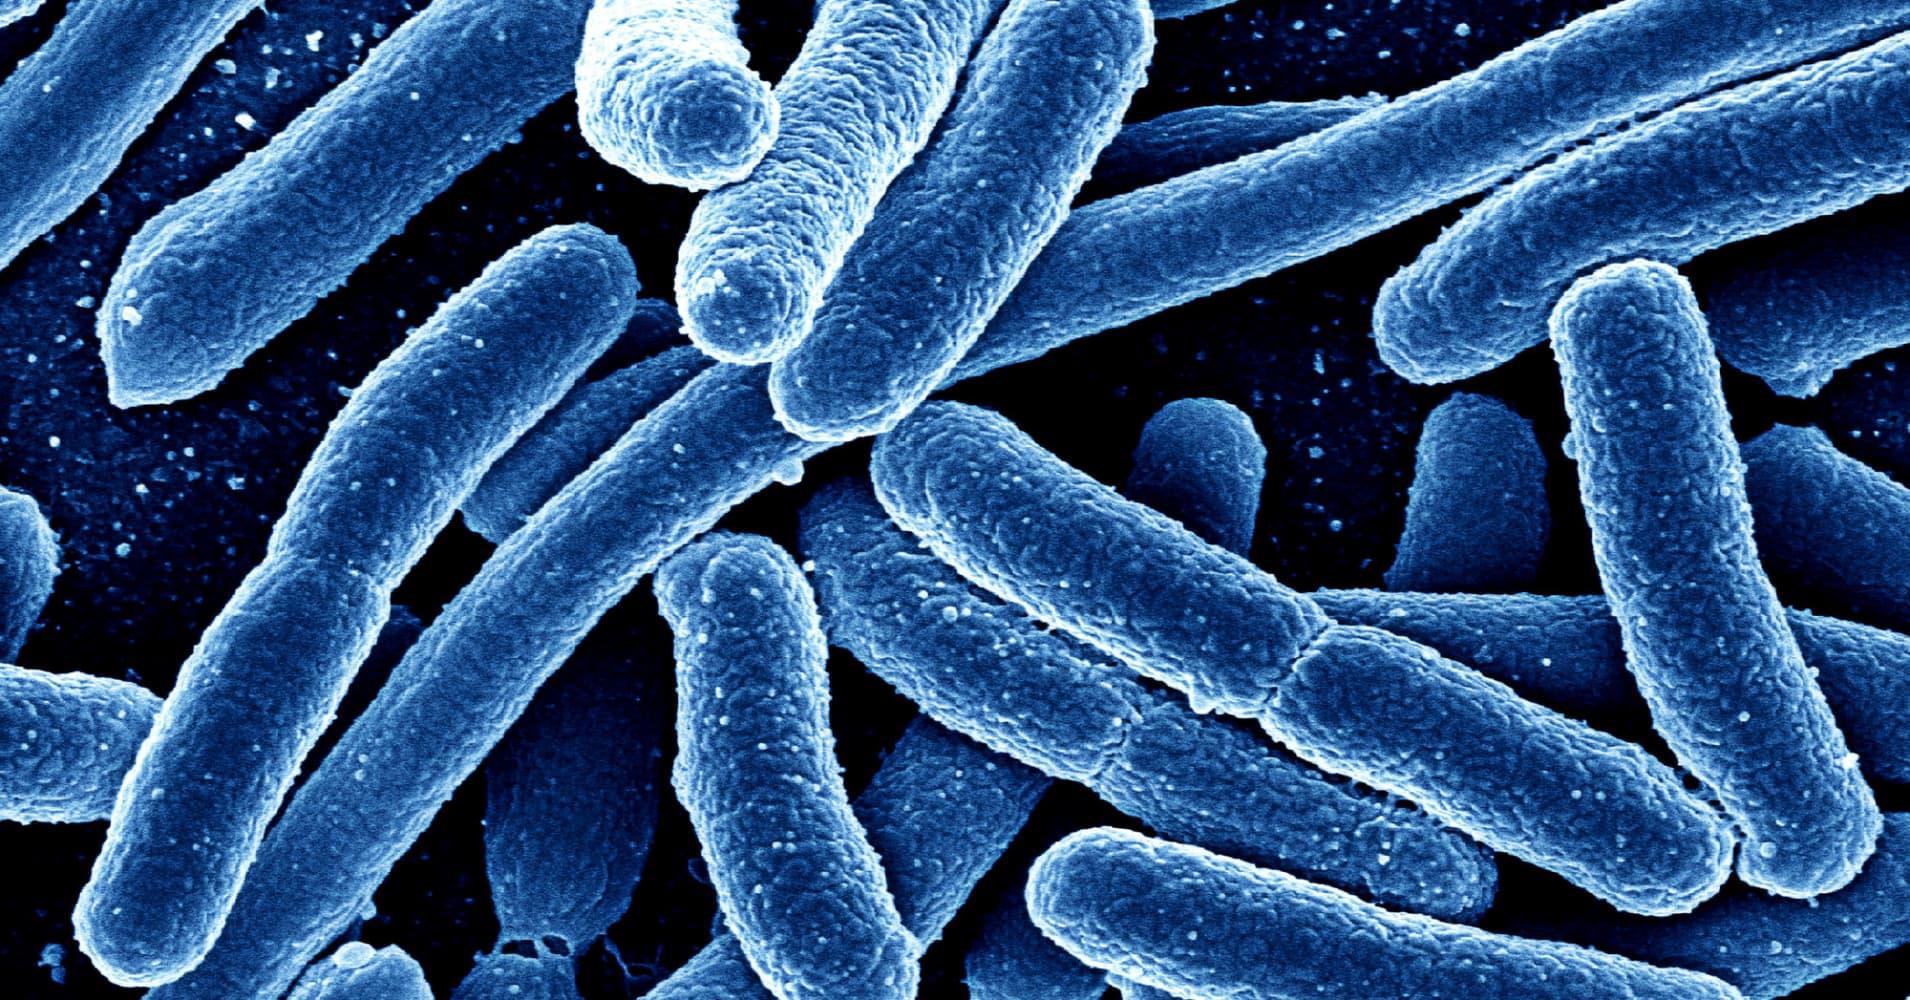 Caltech breakthrough: Bacteria engineered with 'sonar' fight disease